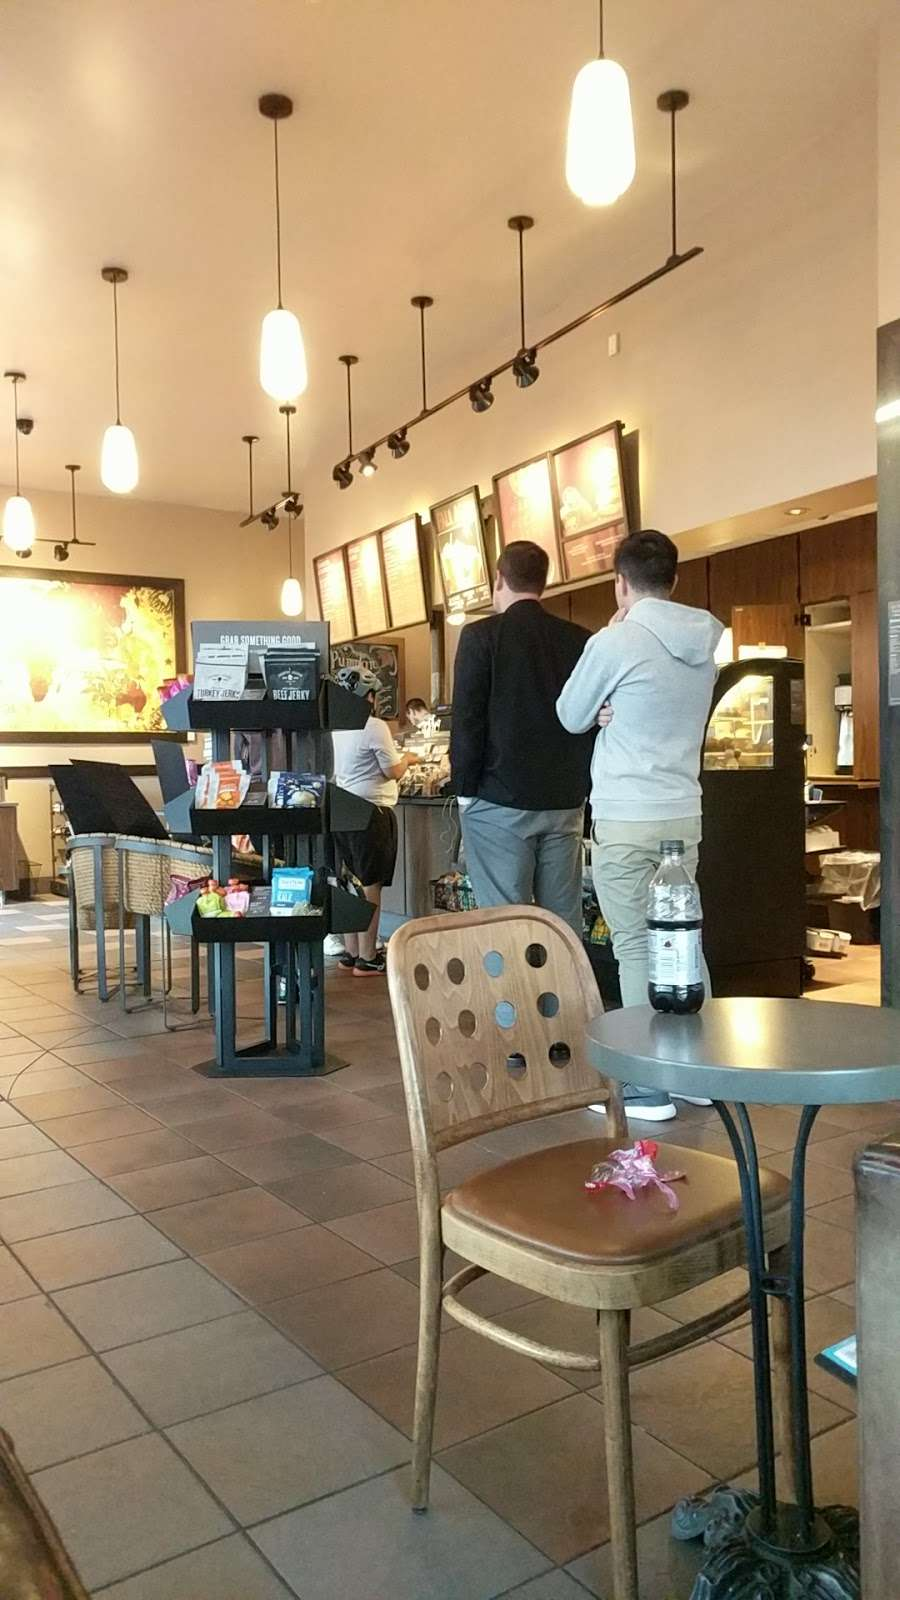 Starbucks - cafe  | Photo 4 of 10 | Address: 1336 Peninsula Blvd, Hewlett, NY 11557, USA | Phone: (516) 295-3330